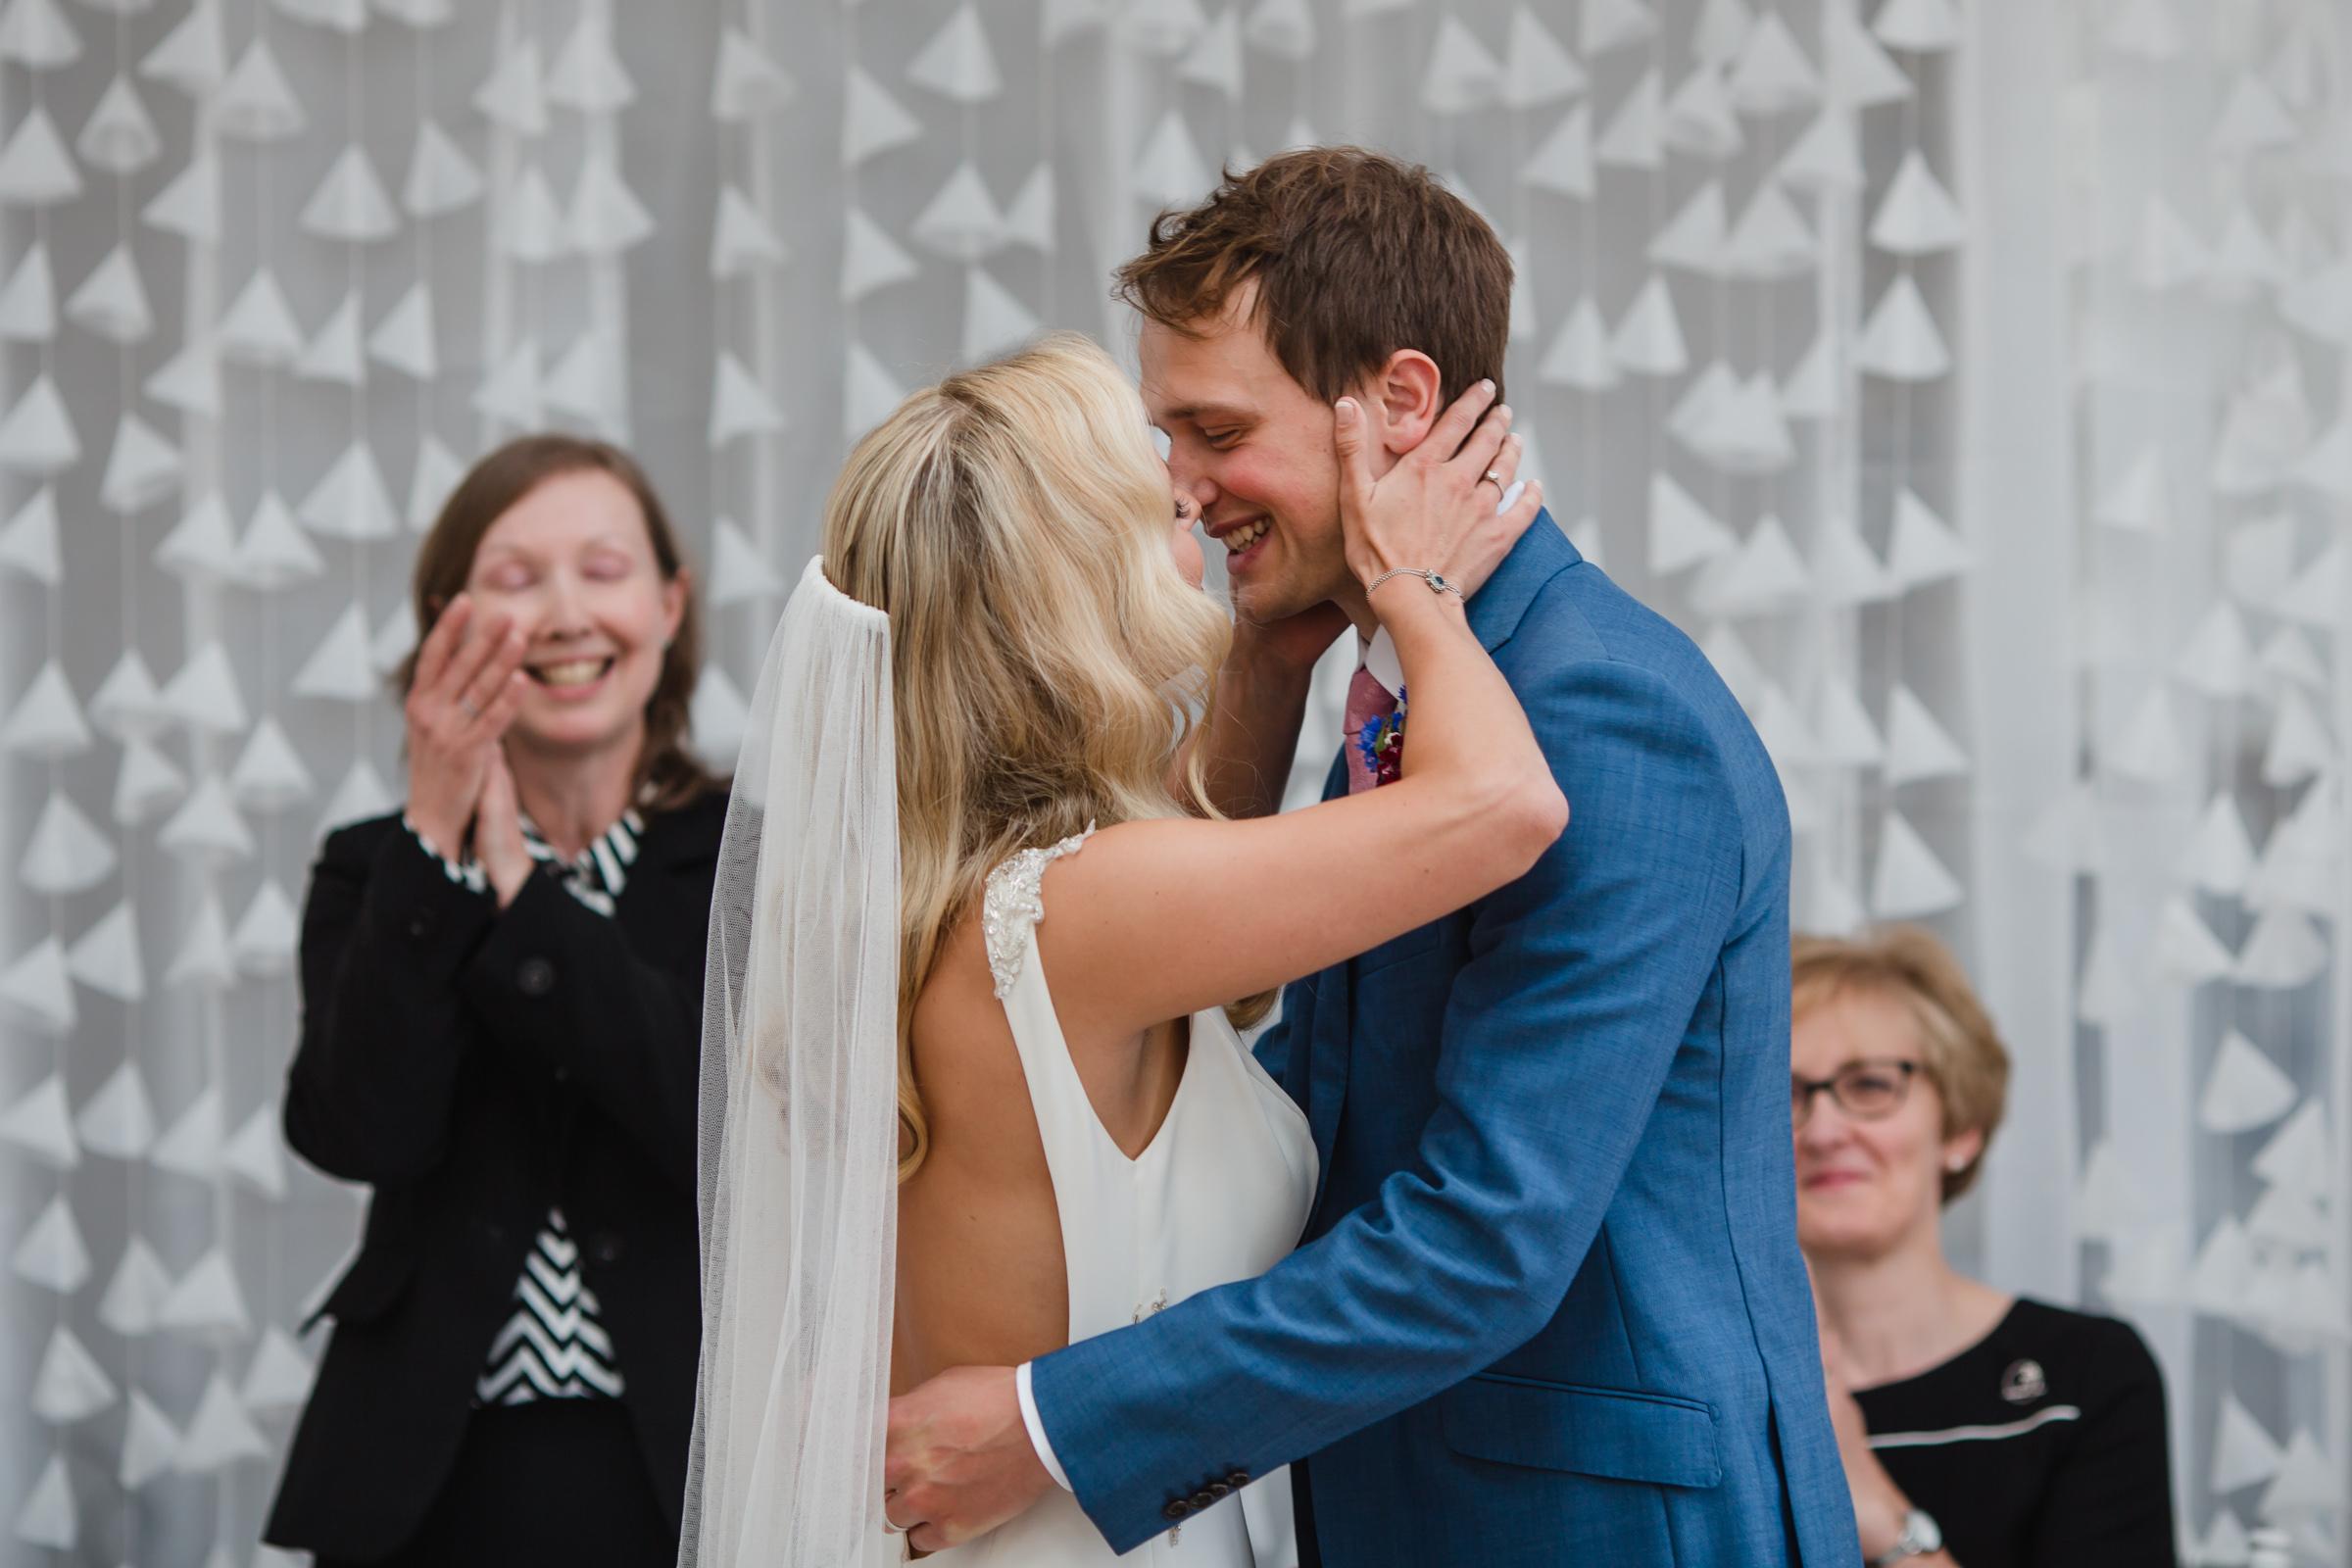 The first kiss at a wedding at fazeley studios birmimgham